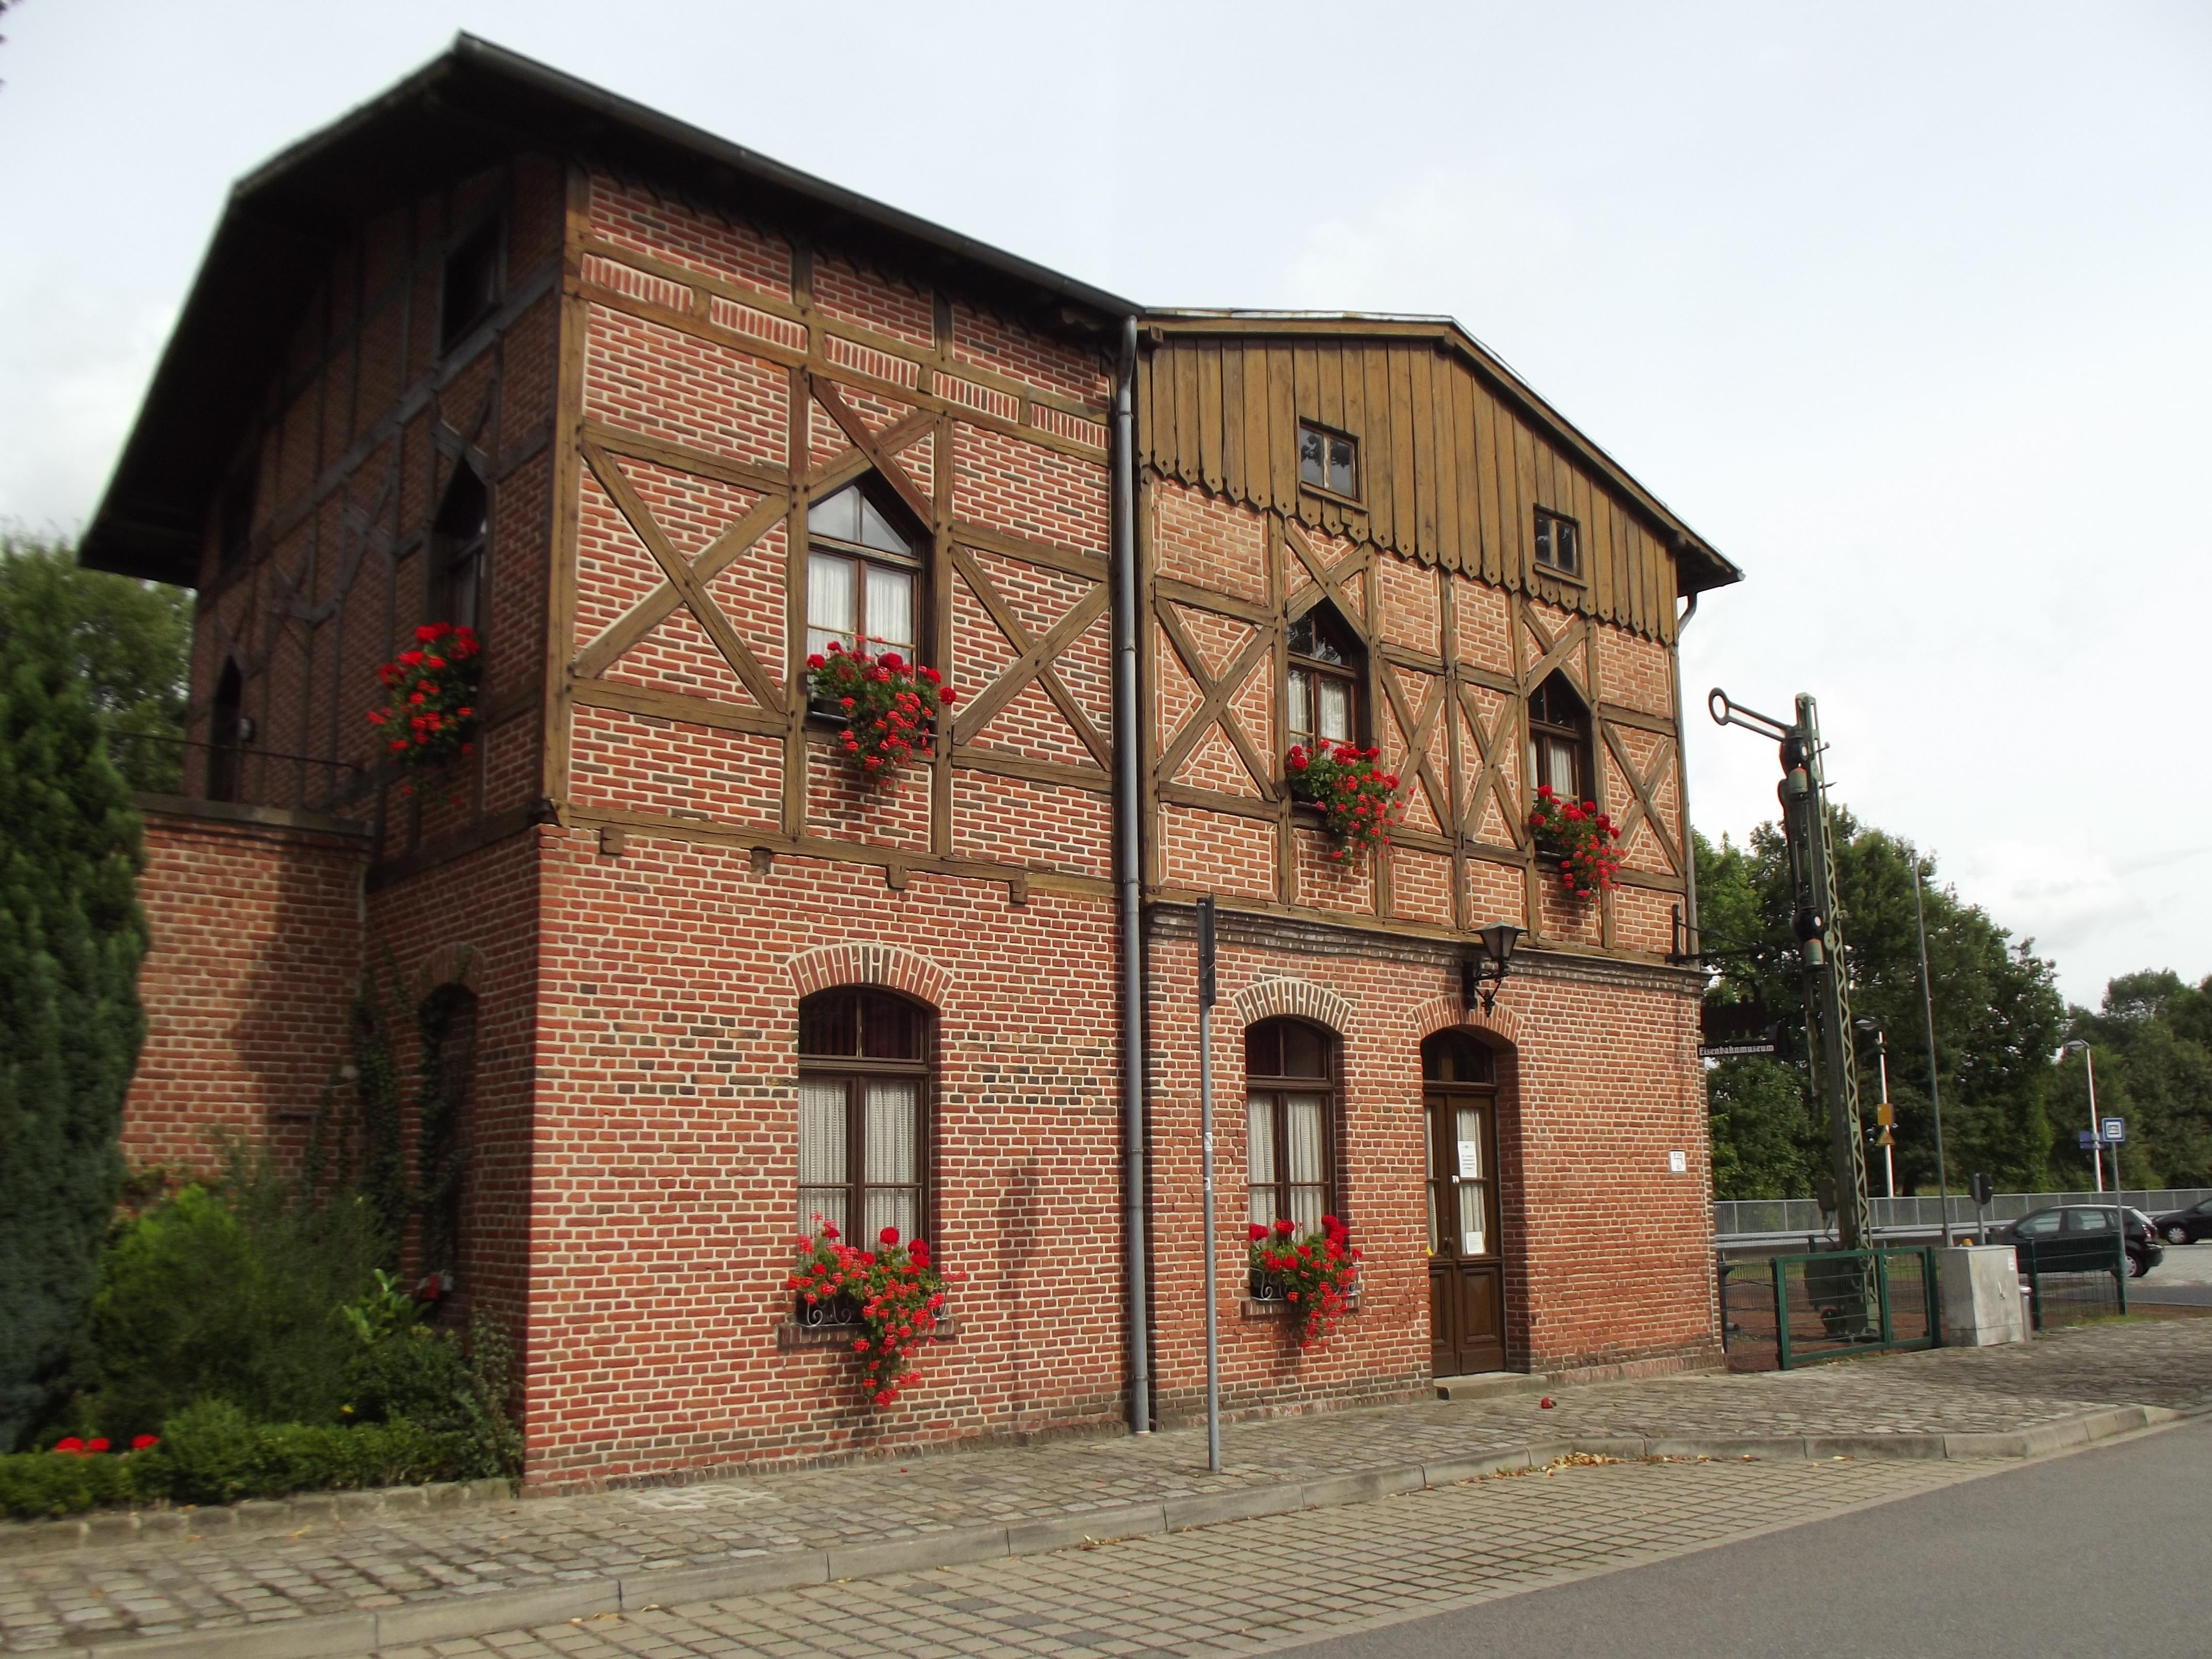 File:Rural railway station built timber framing style.jpg ...